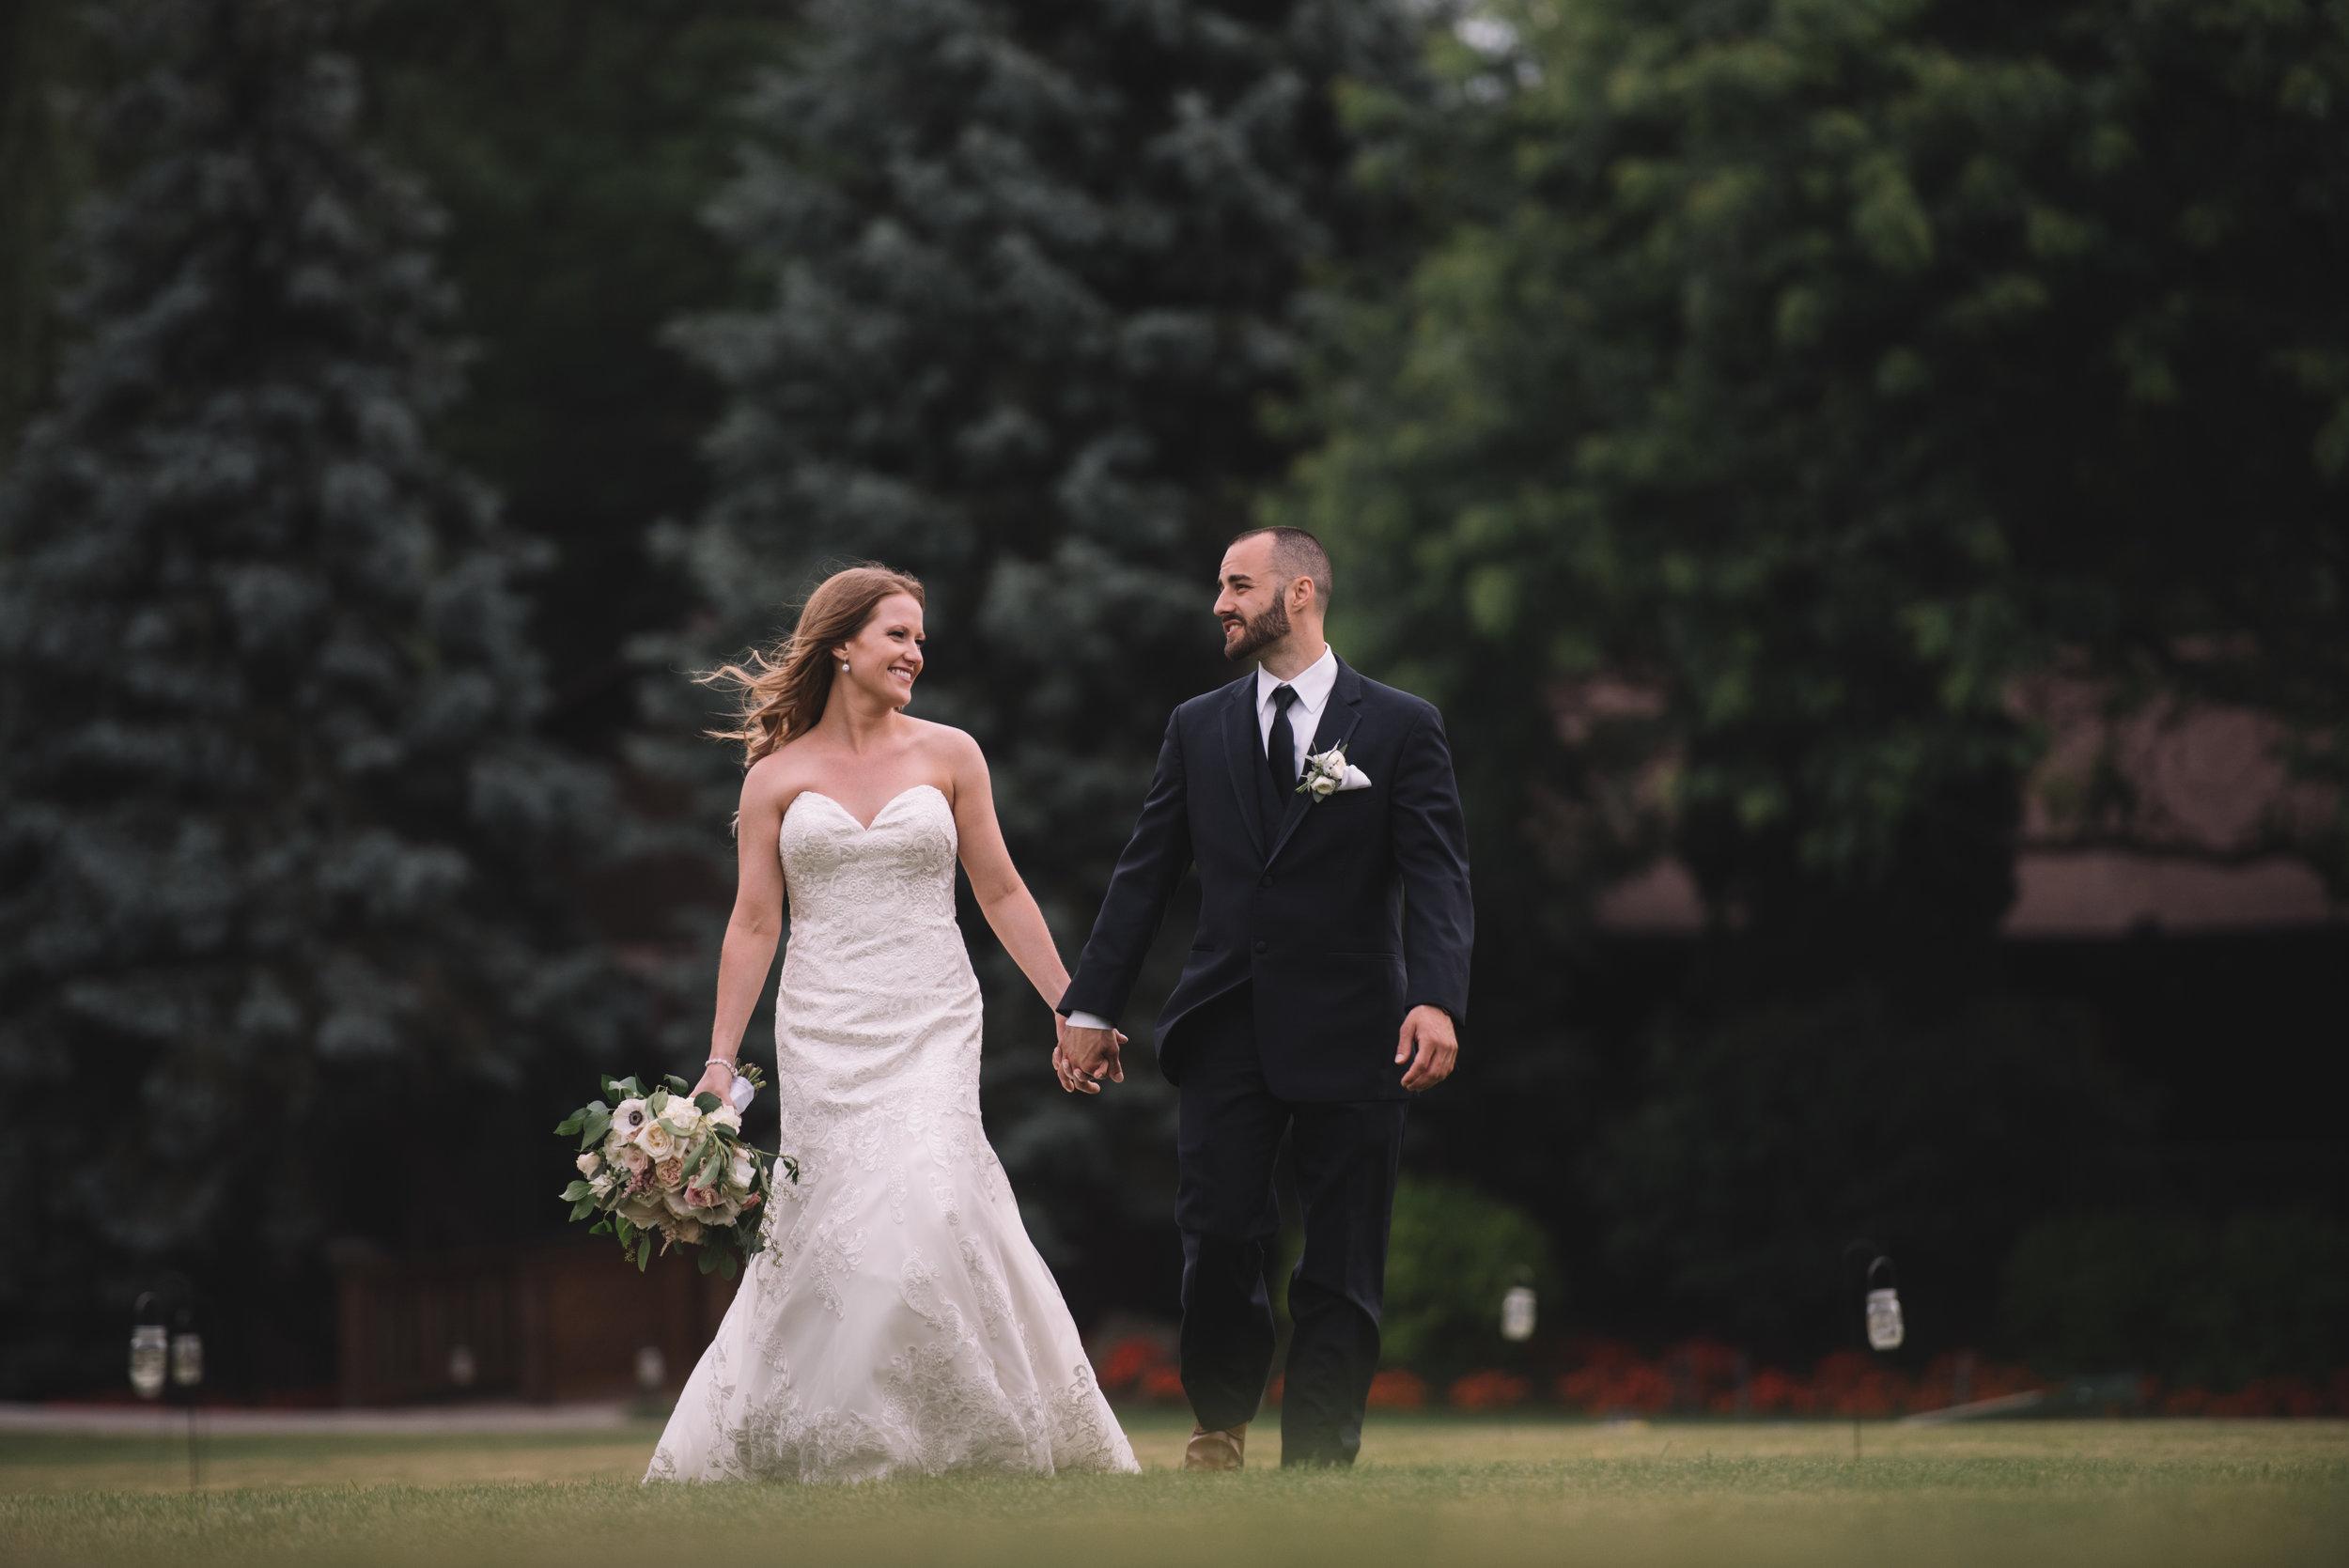 WeddingPhotos | NJPhotographer | Highlights-5-6.jpg